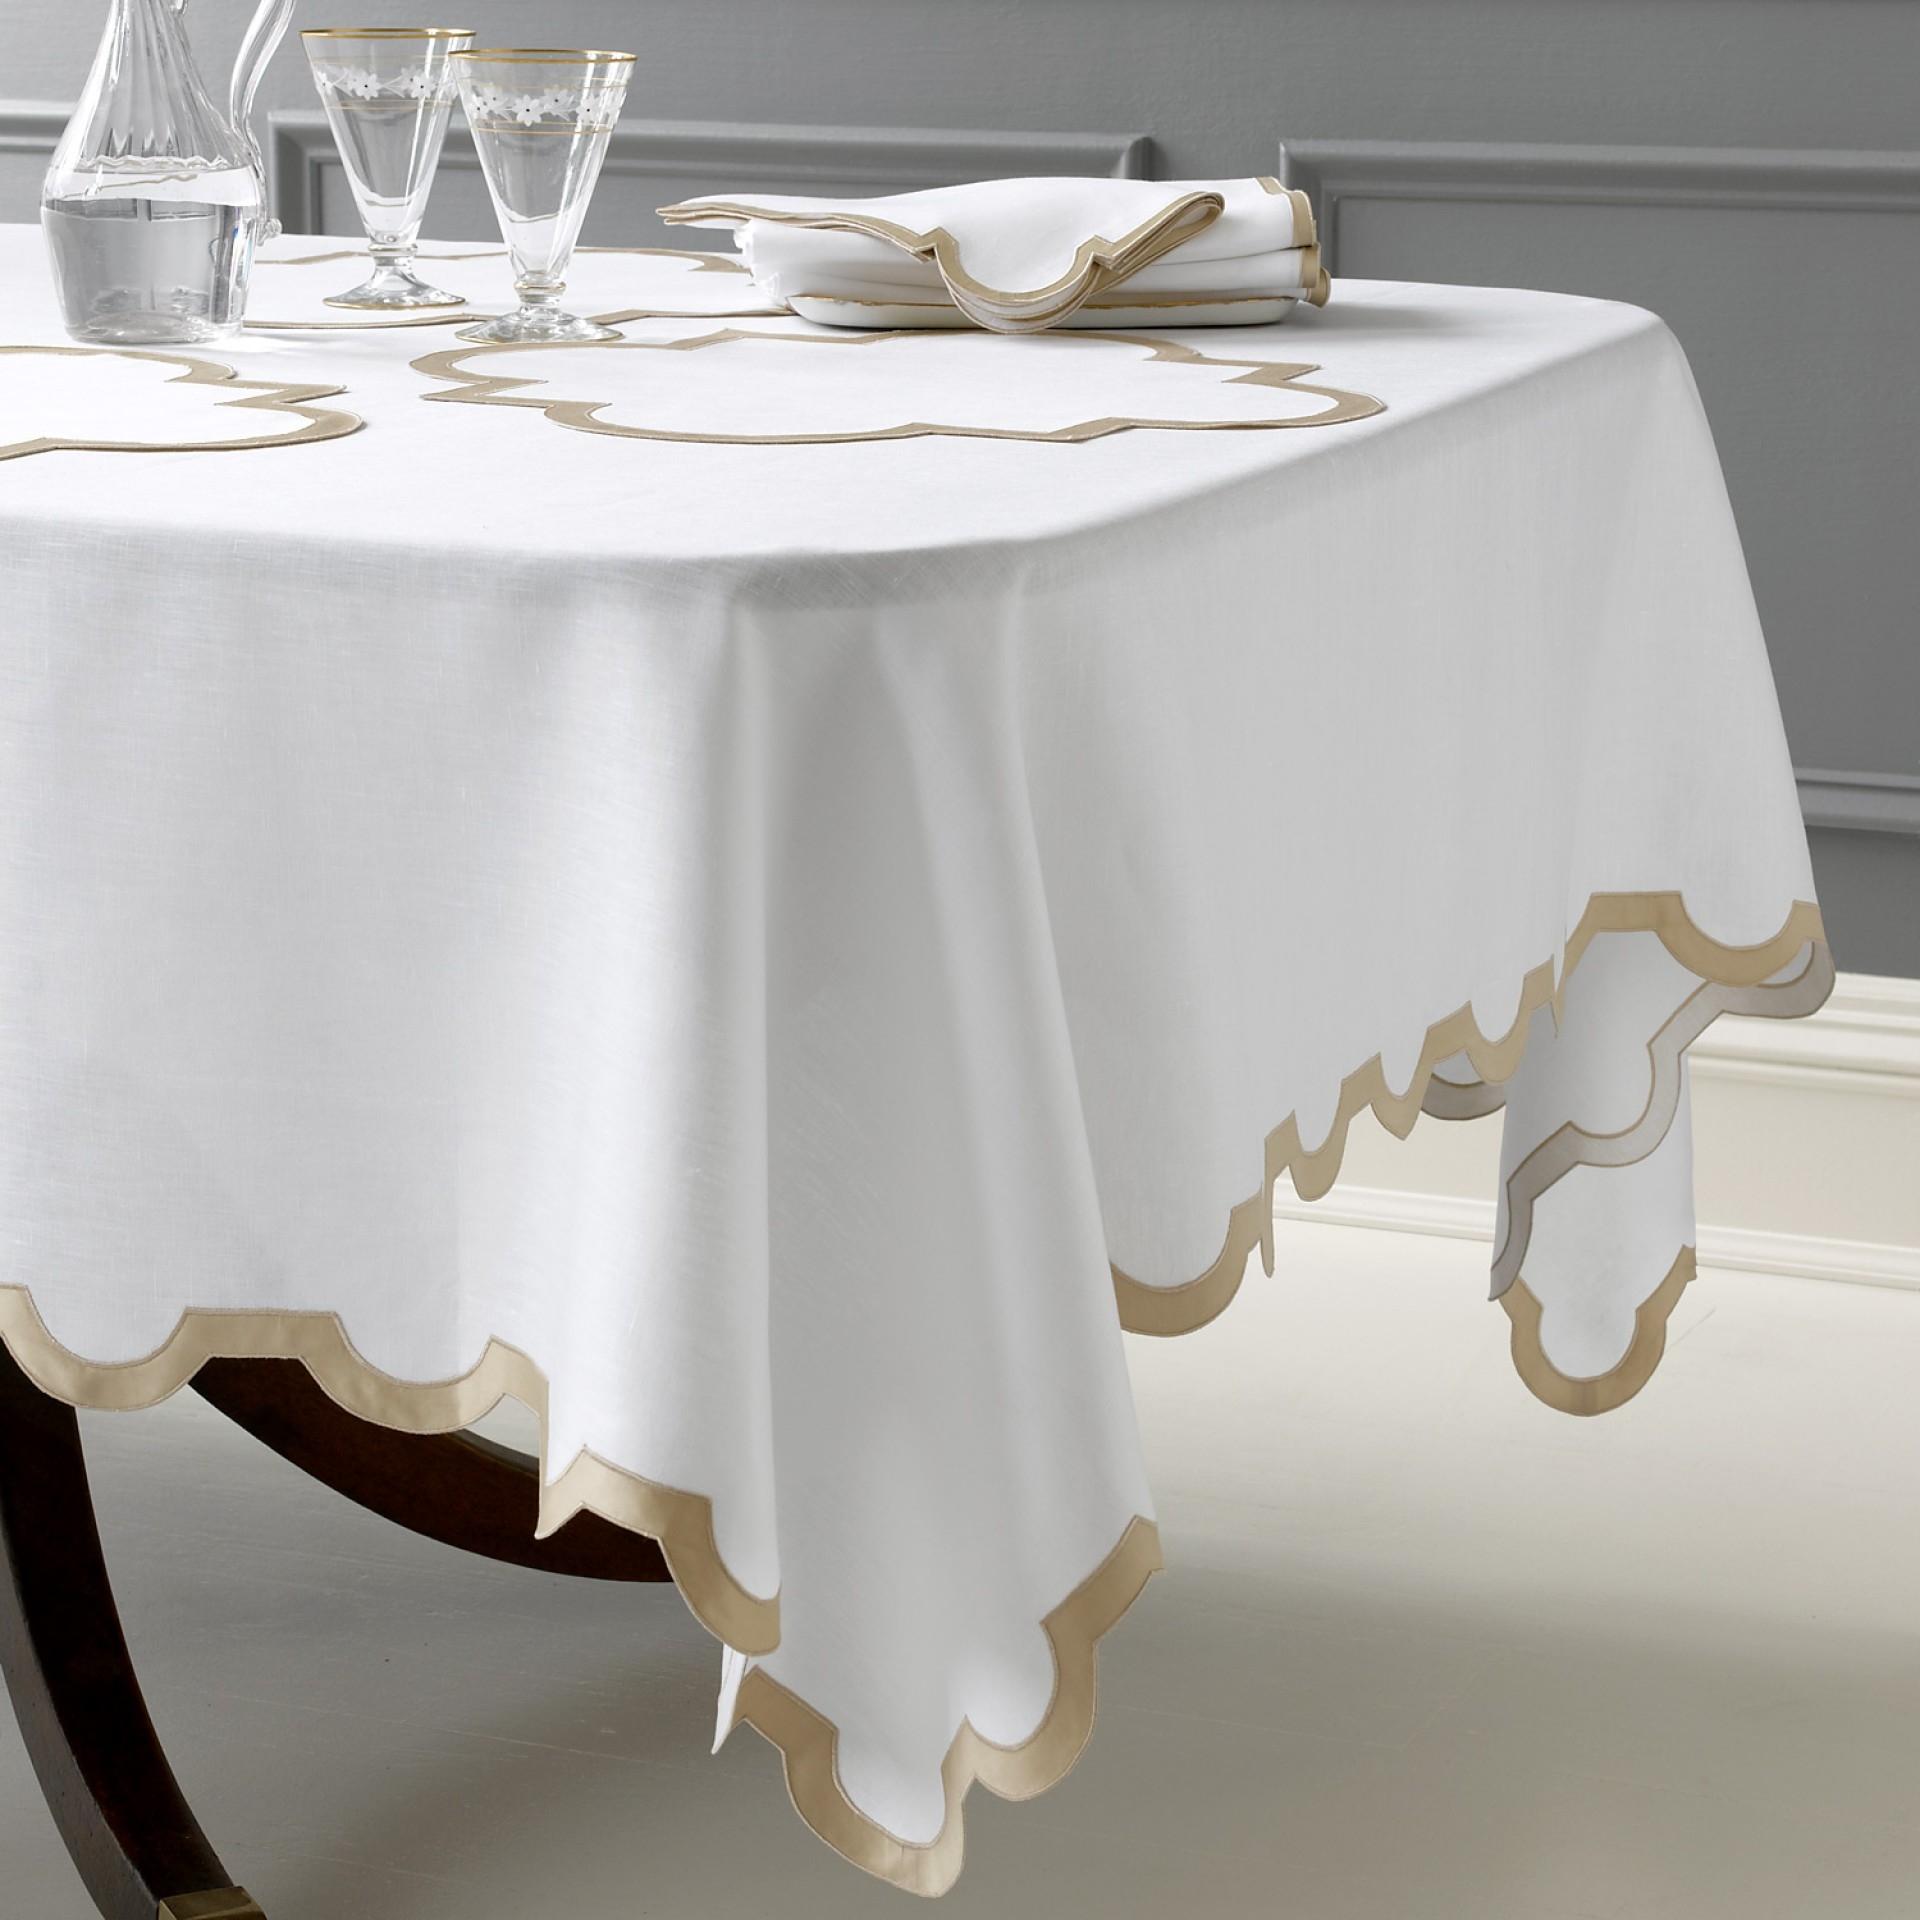 table linens ... matouk - mirasol napkins, placemats, tablecloths ULHNDAP